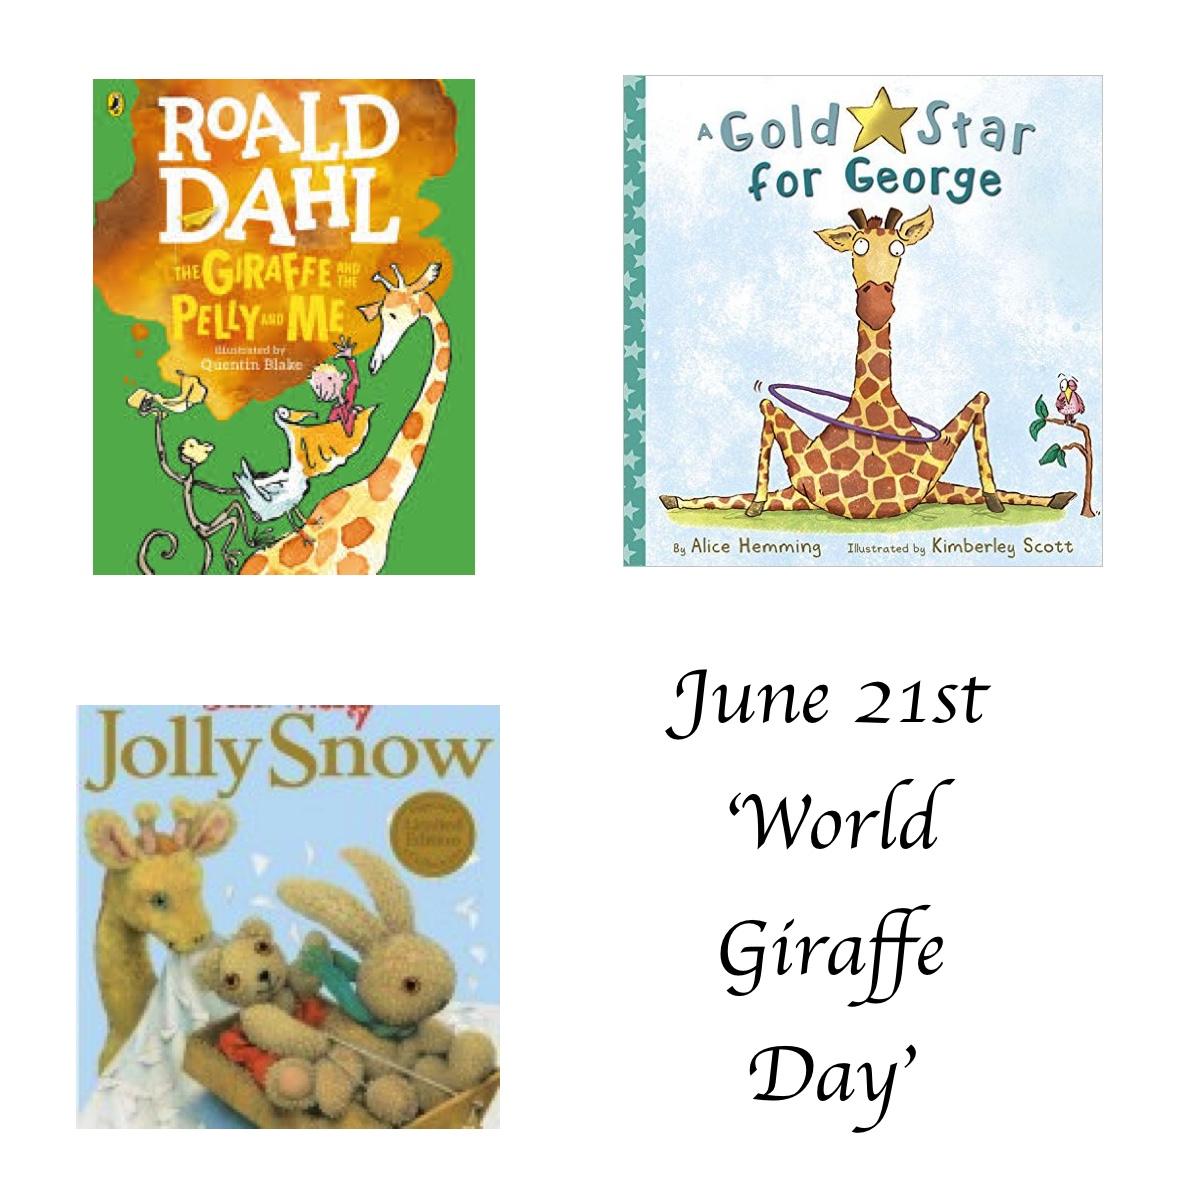 World Giraffe Day - Story Snug